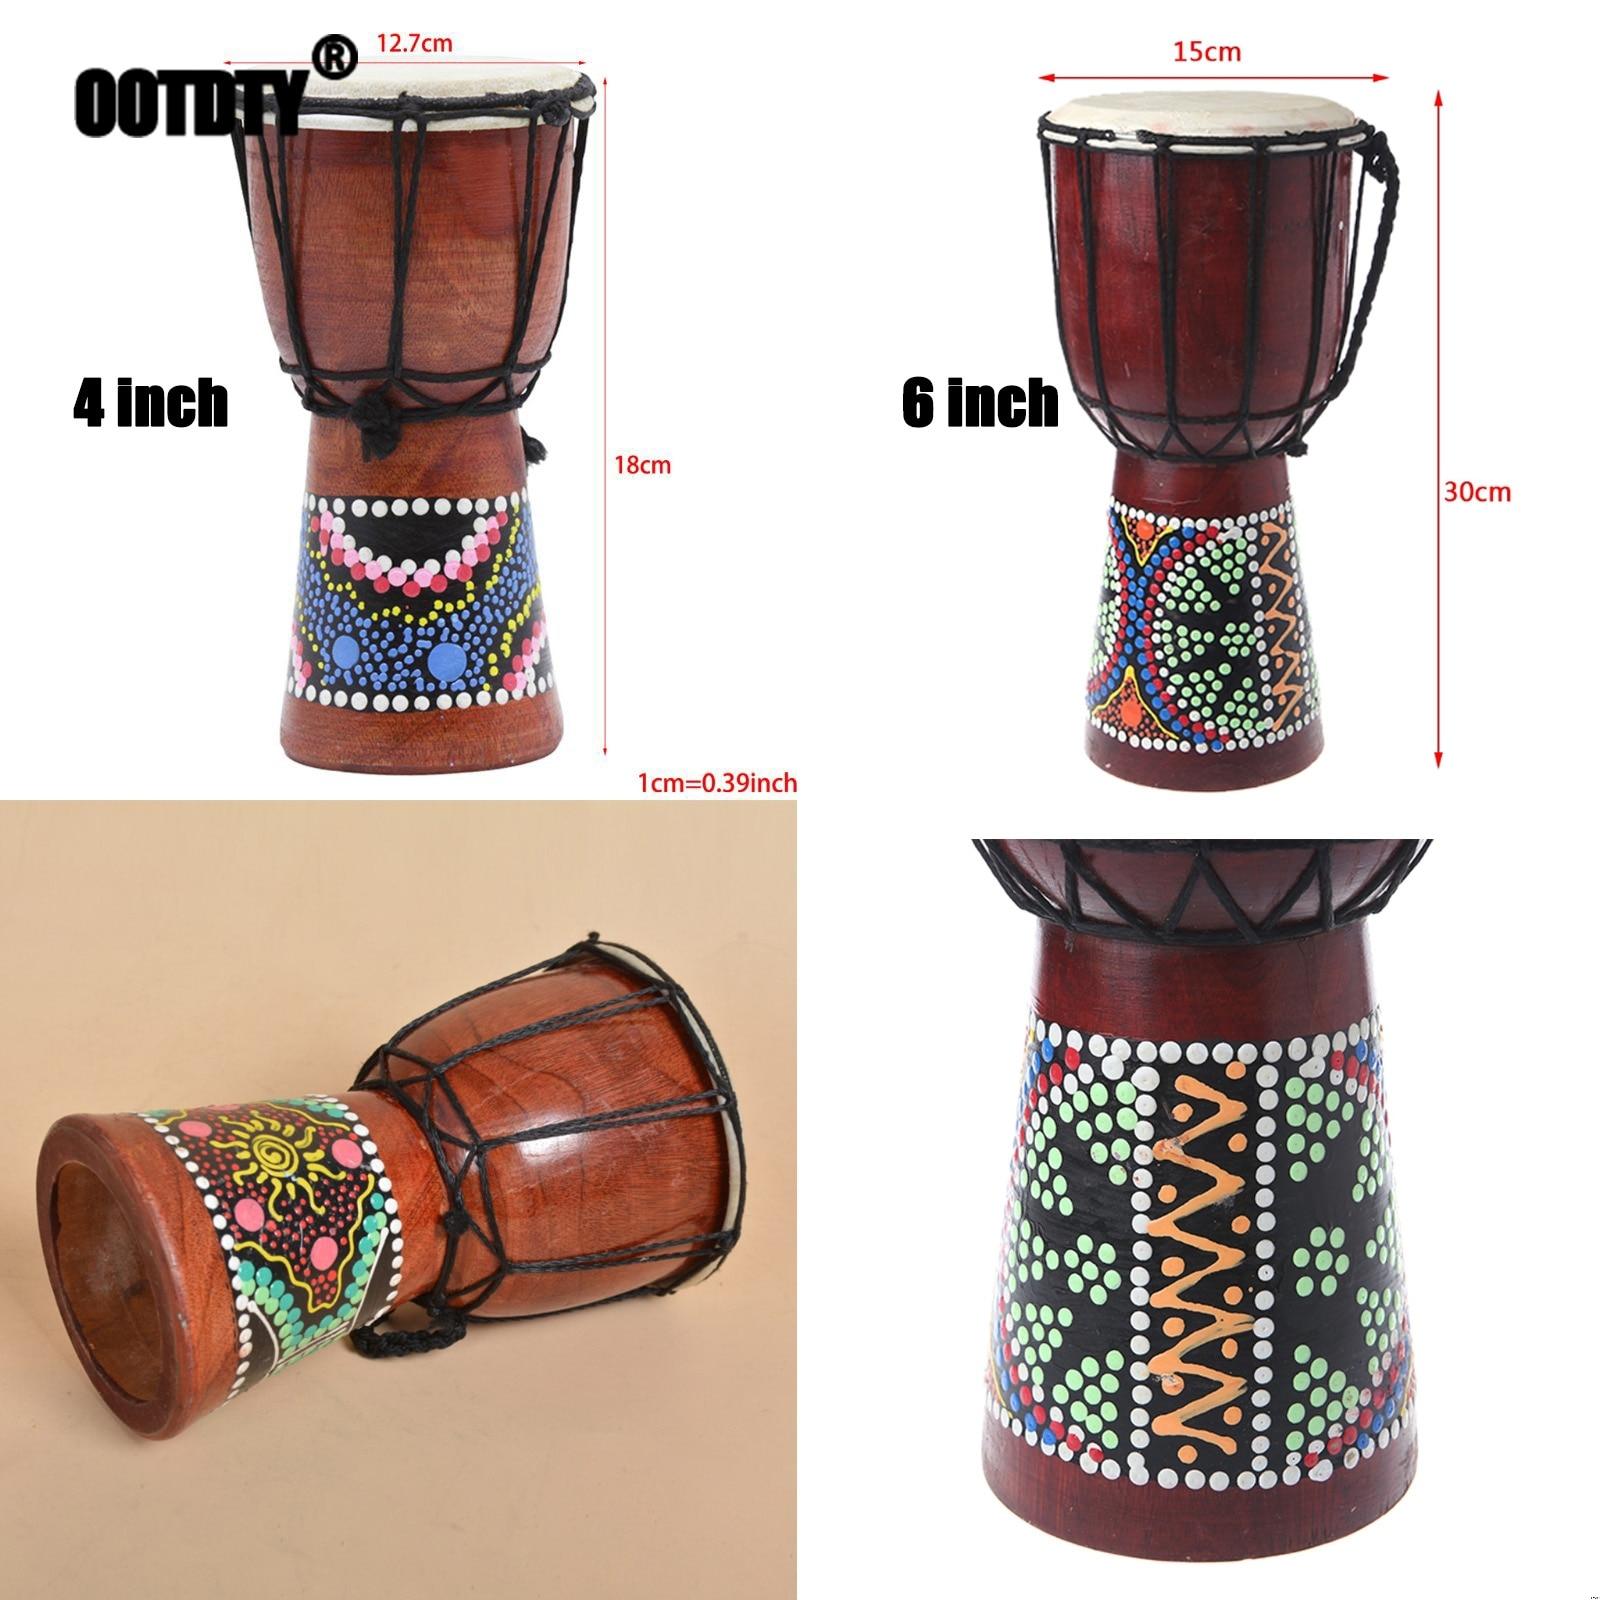 18cm/30cm Professional African Djembe Drum Bongo Wooden Good Sound Musical Instrument